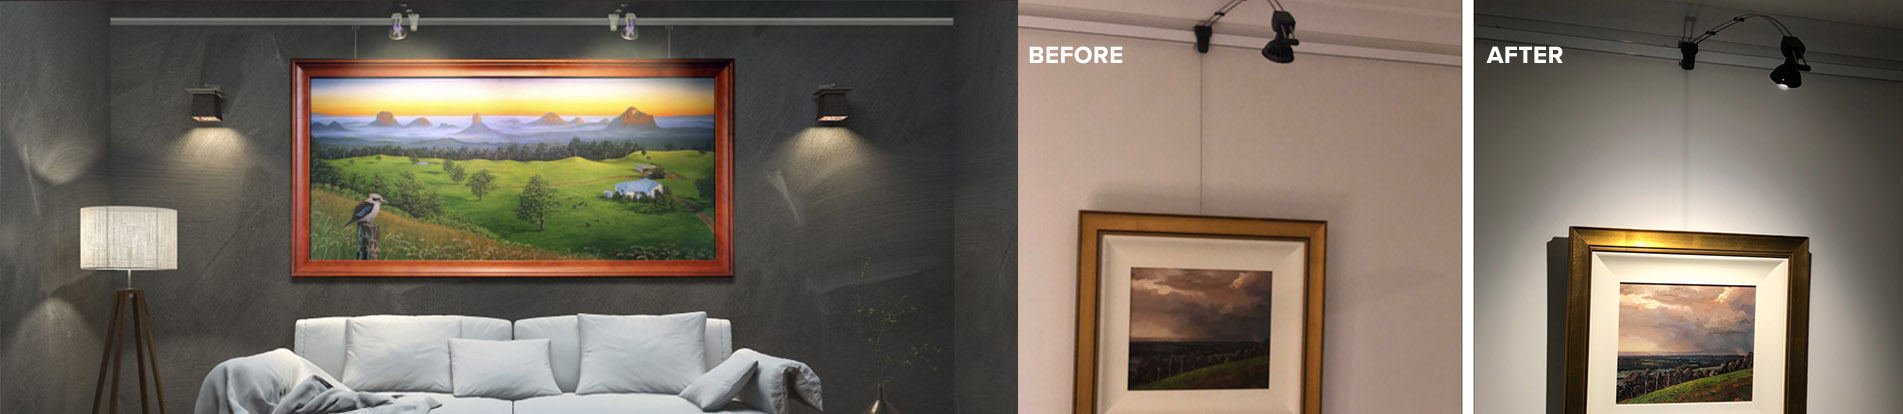 Gallery lighting system